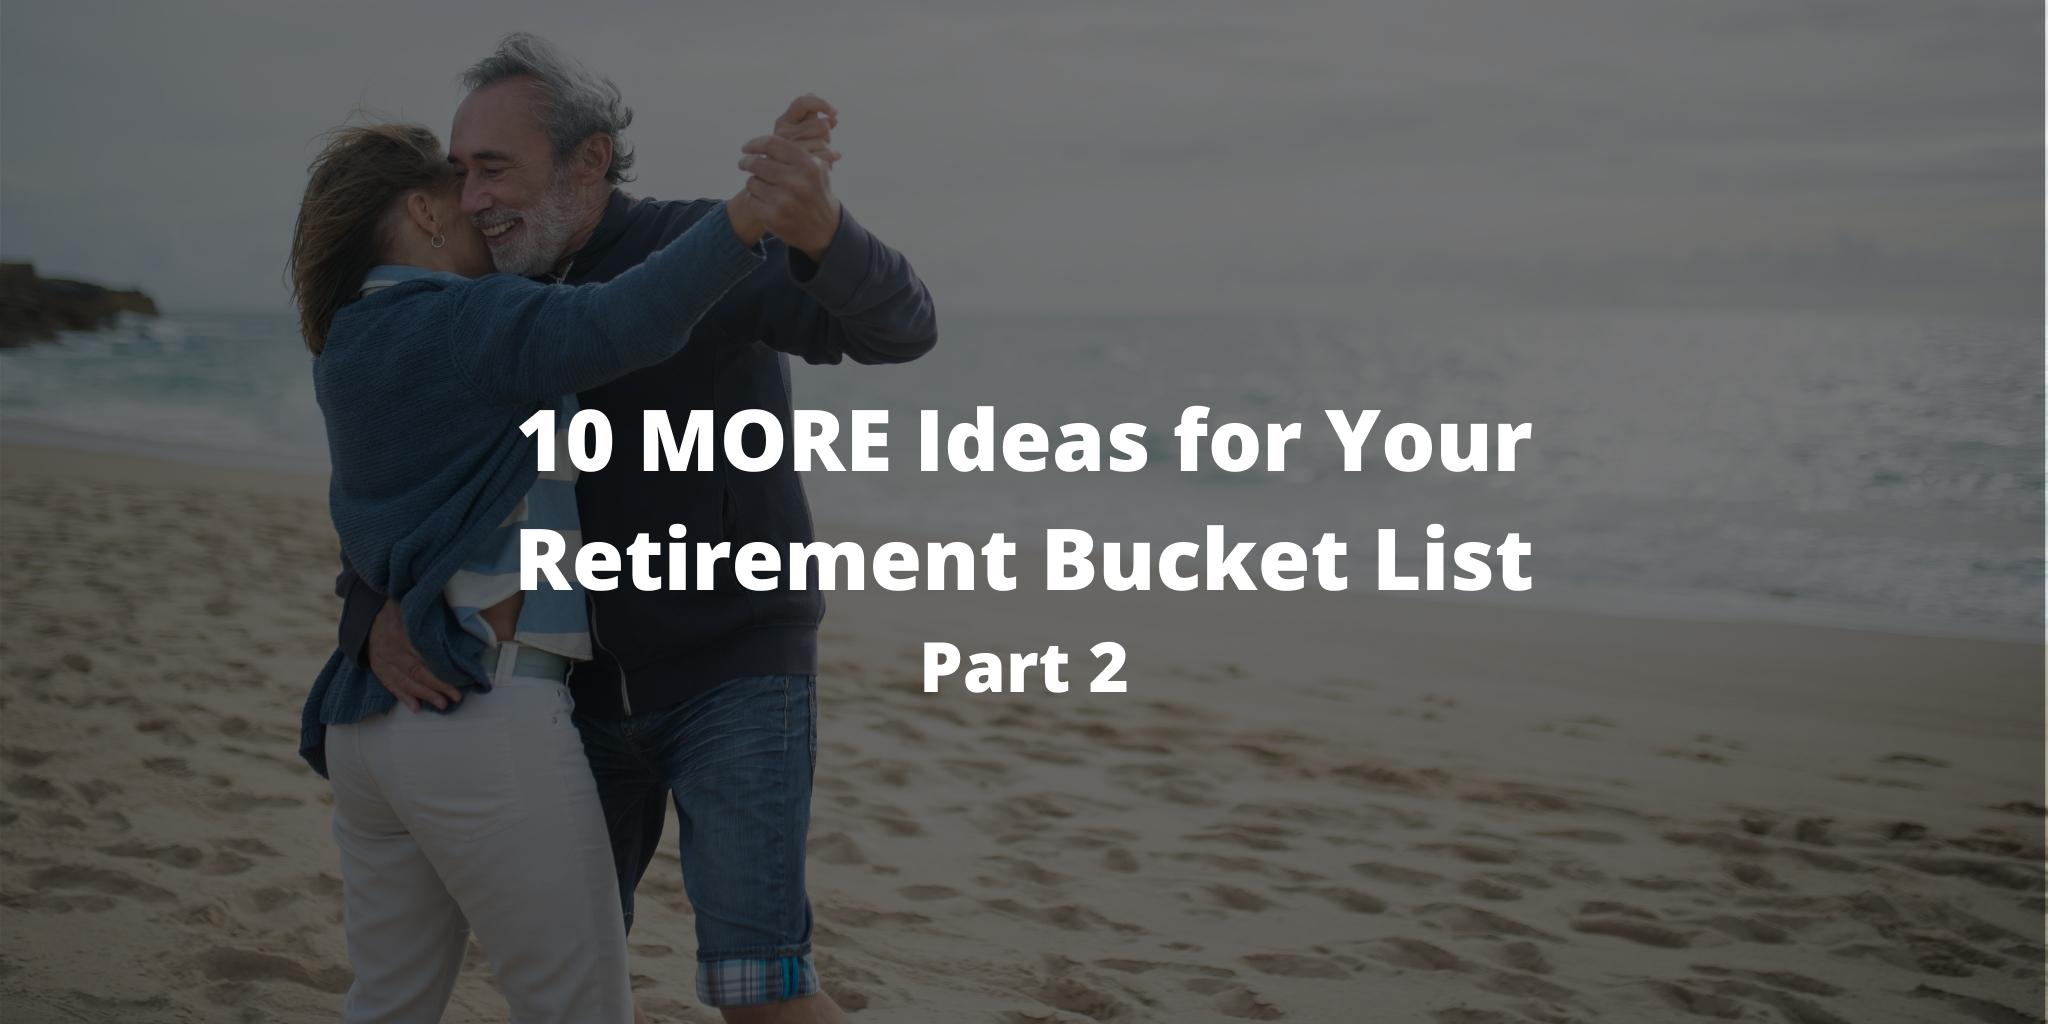 10 MORE Ideas for Your Retirement Bucket List: Part 2